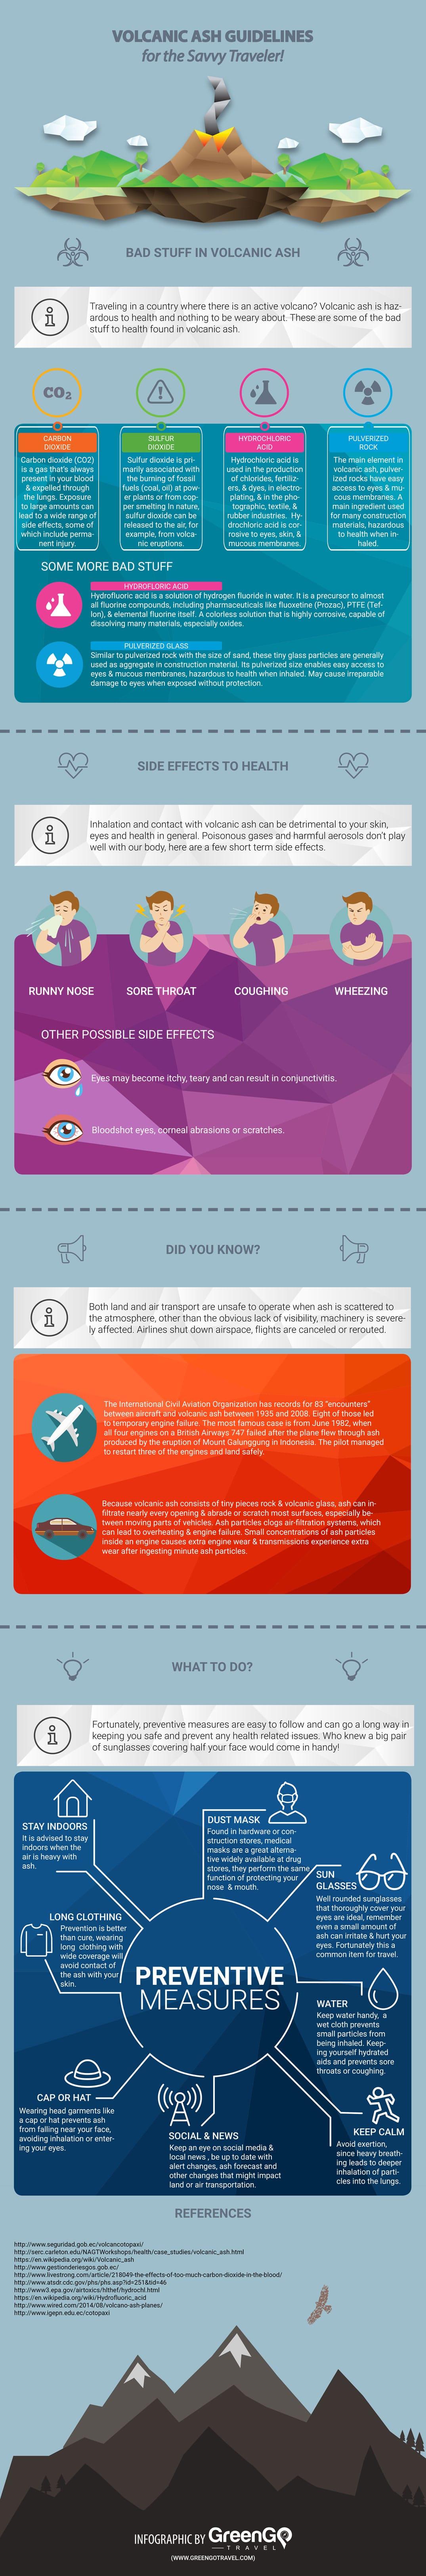 cotopaxi-volcano-ash-guidelines